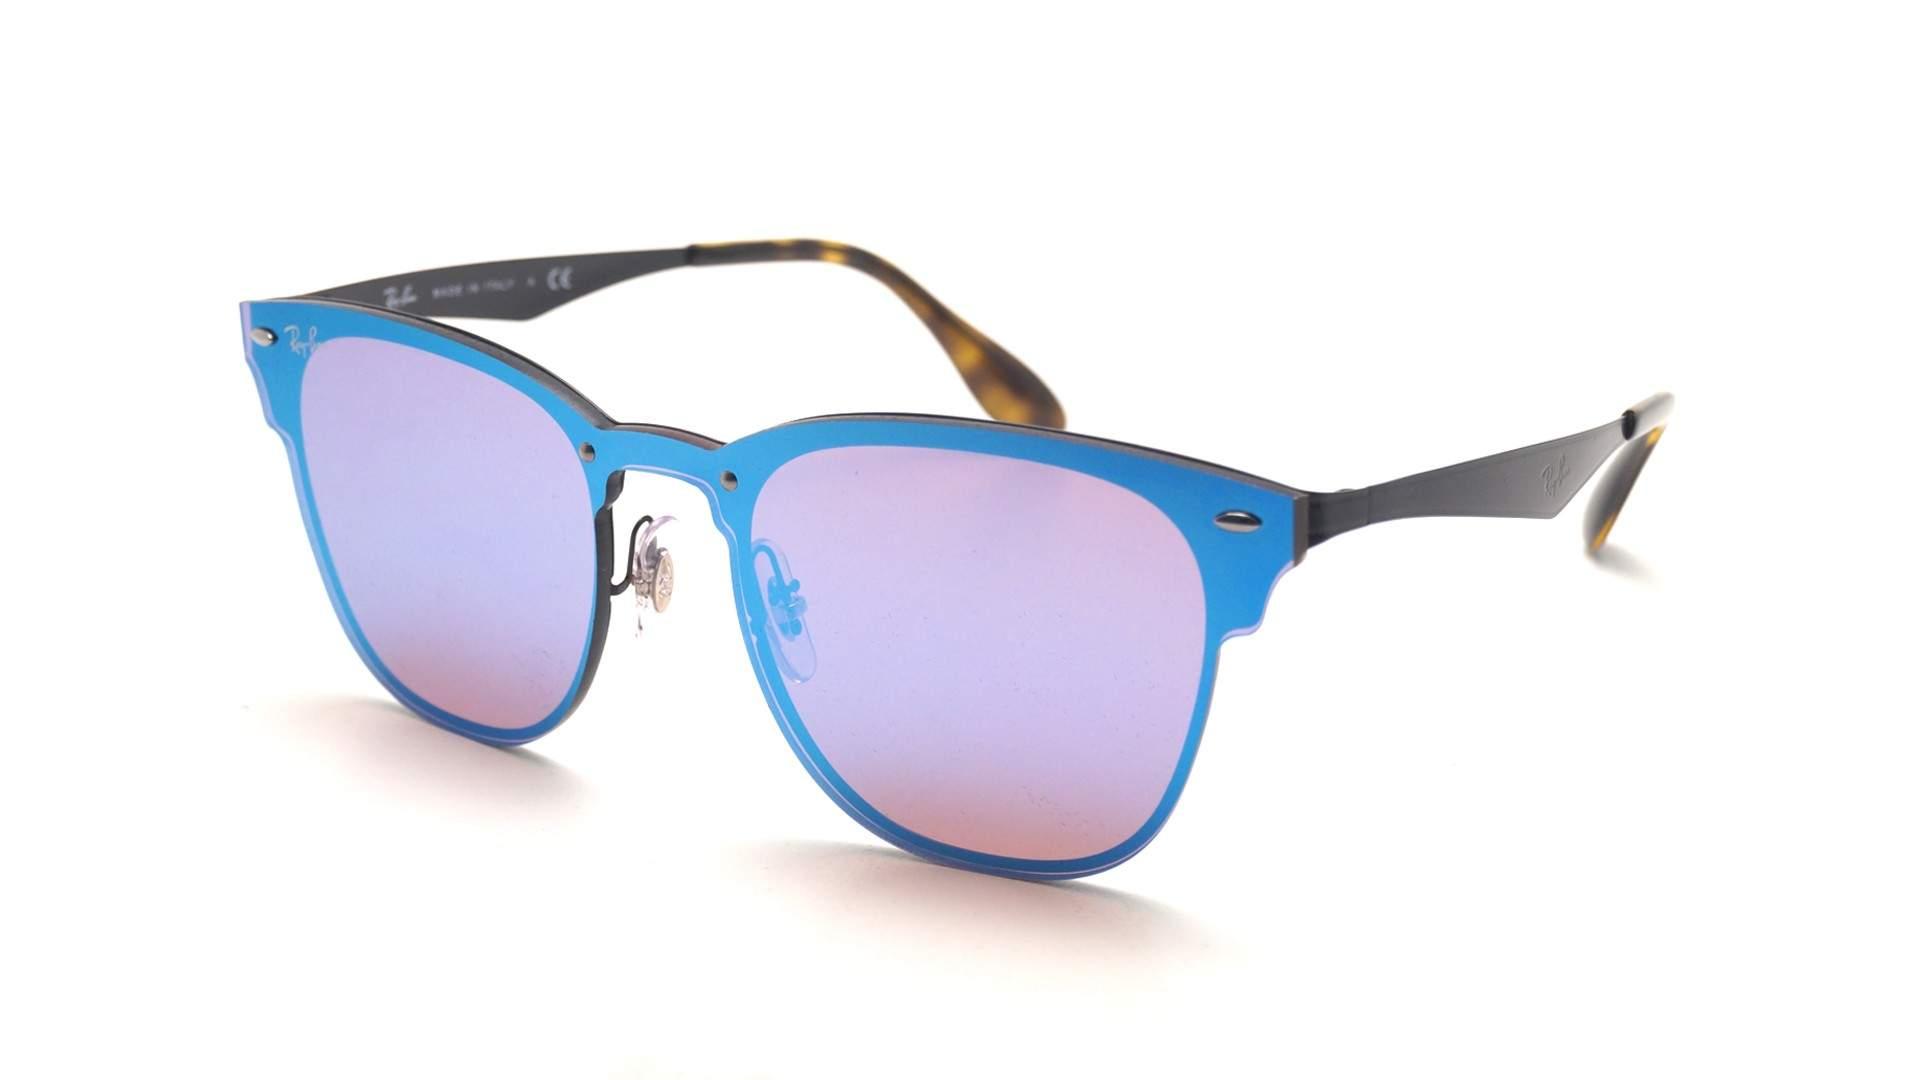 aef2d4d991052 Sunglasses Ray-Ban Clubmaster Blaze Black RB3576N 153 7V Large Mirror